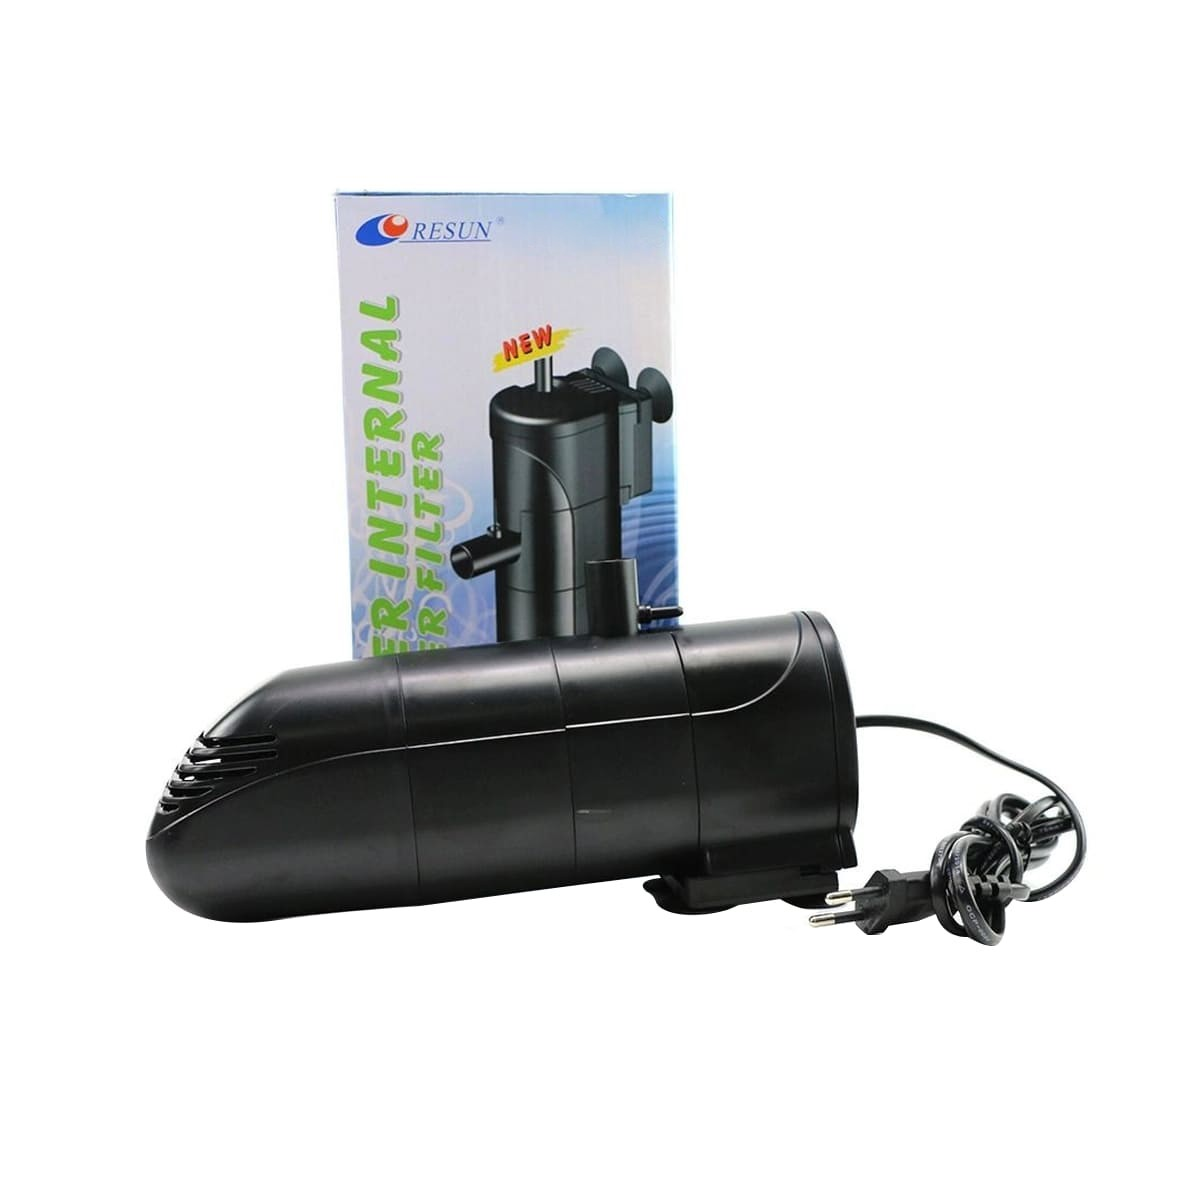 Filtro interno para Aquários Resun Cruiser CS1500 - 1500L/H